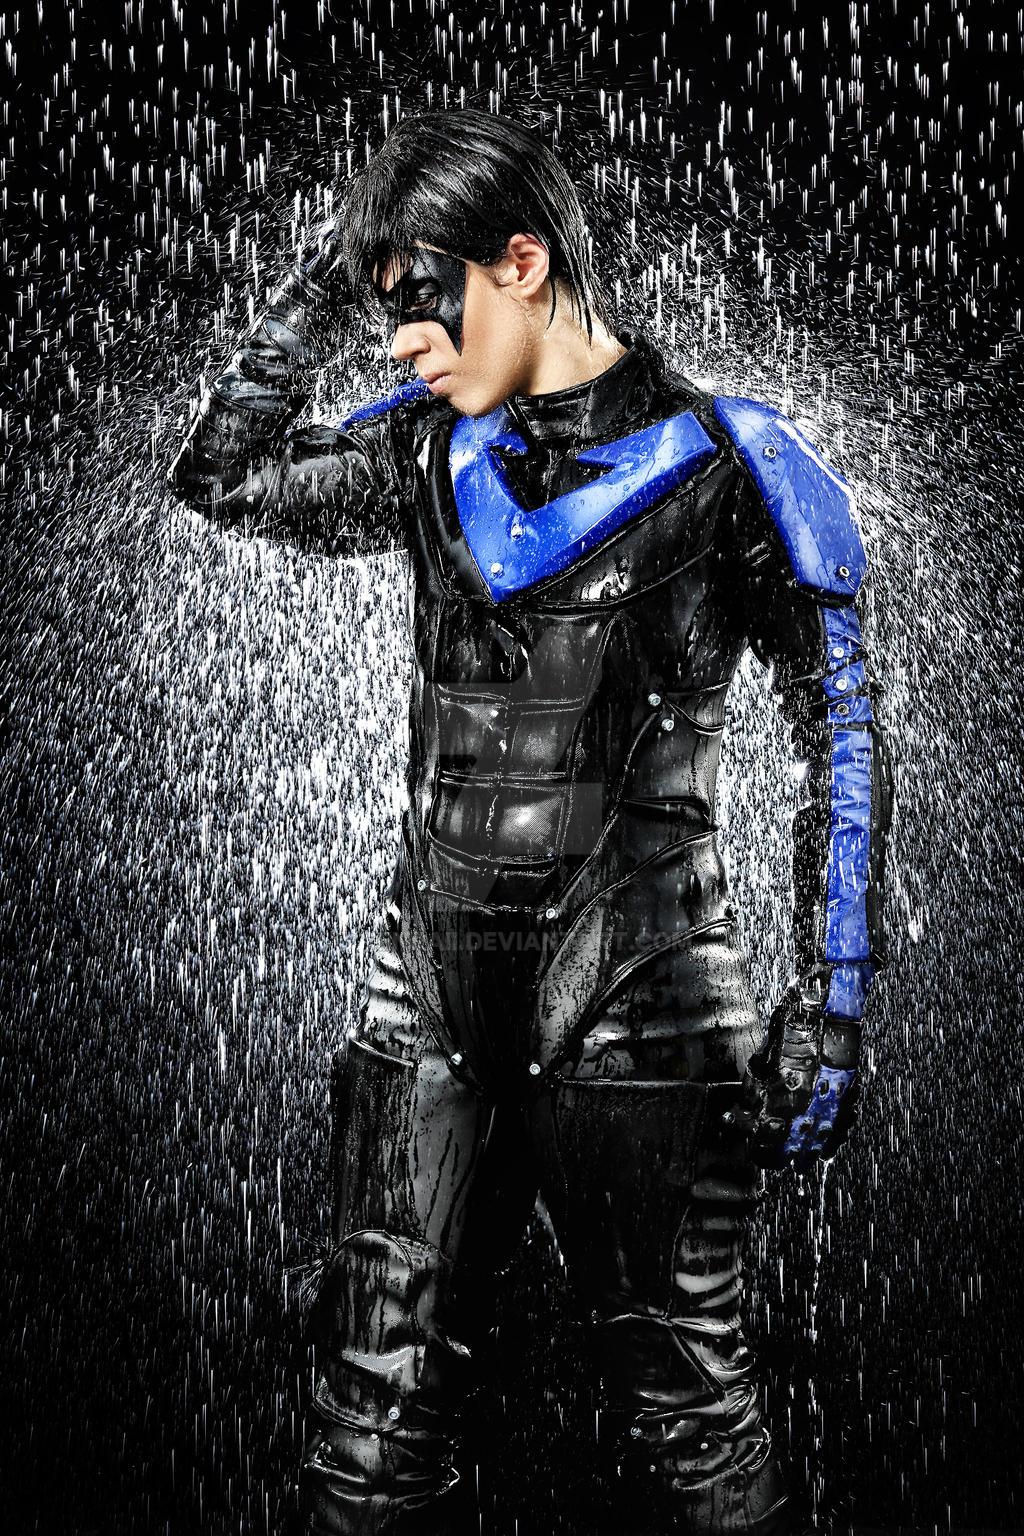 Geiles Cosplay Kostüm